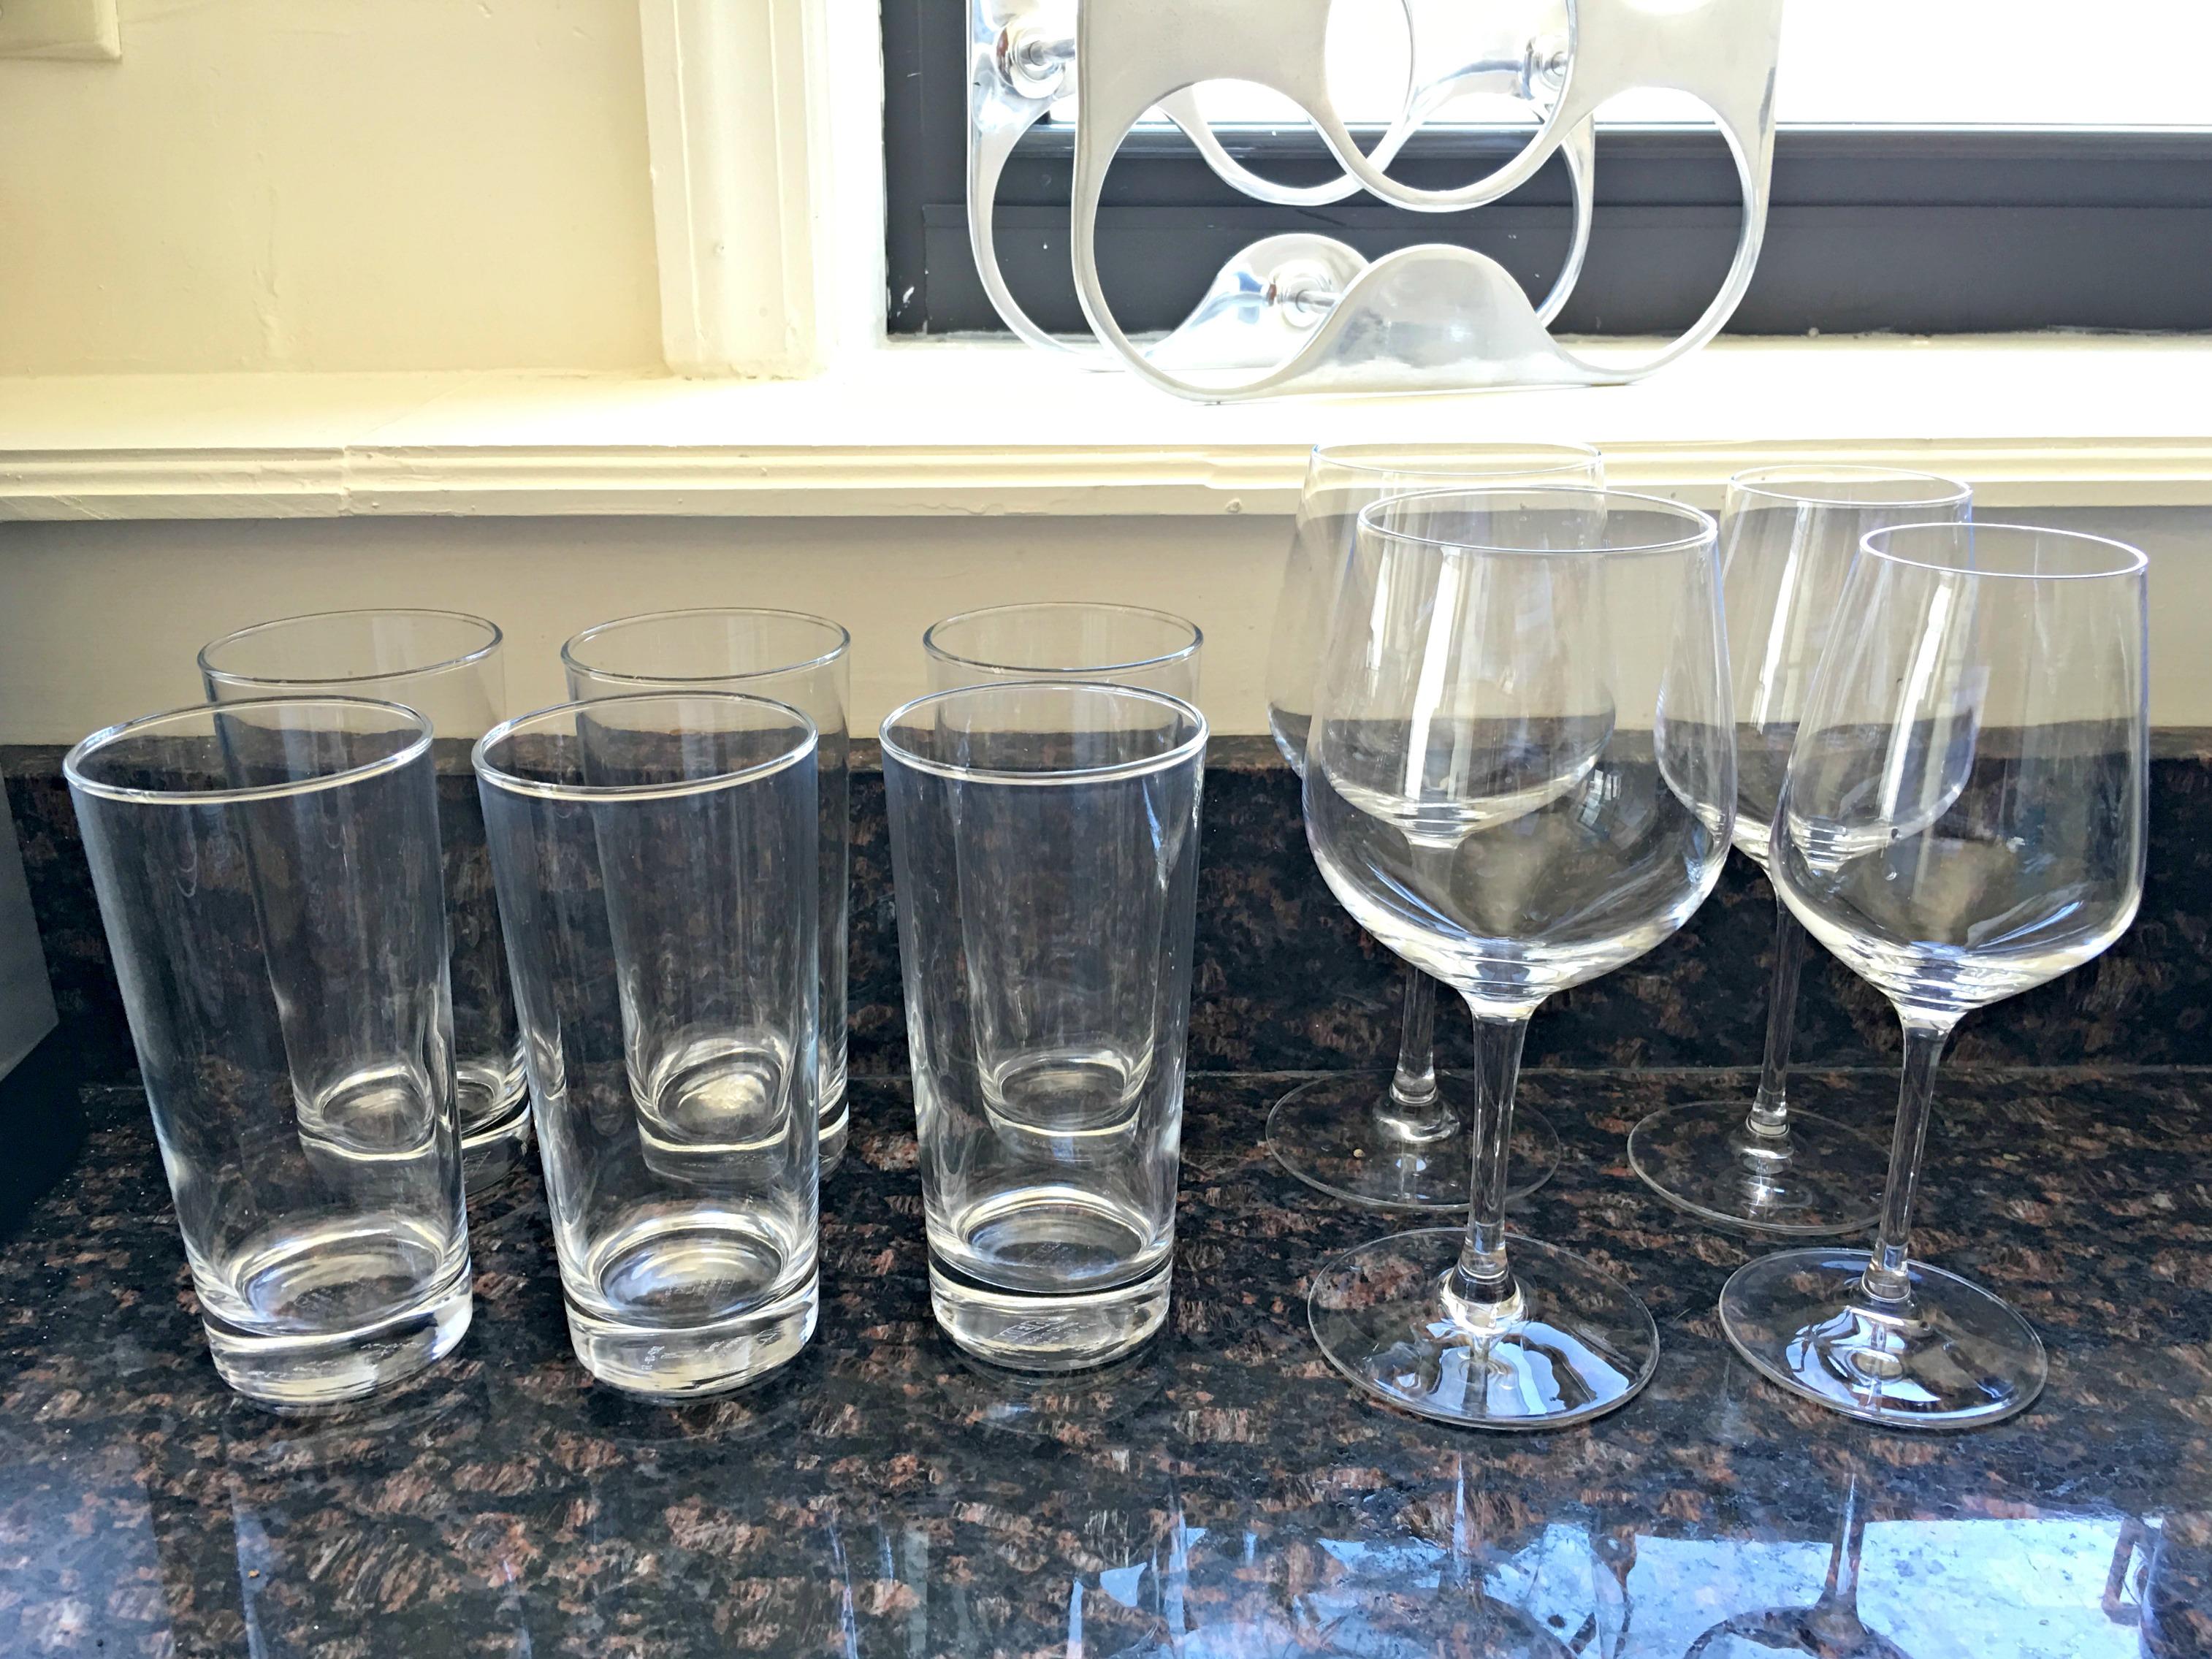 IKEA glasses and wine glasses